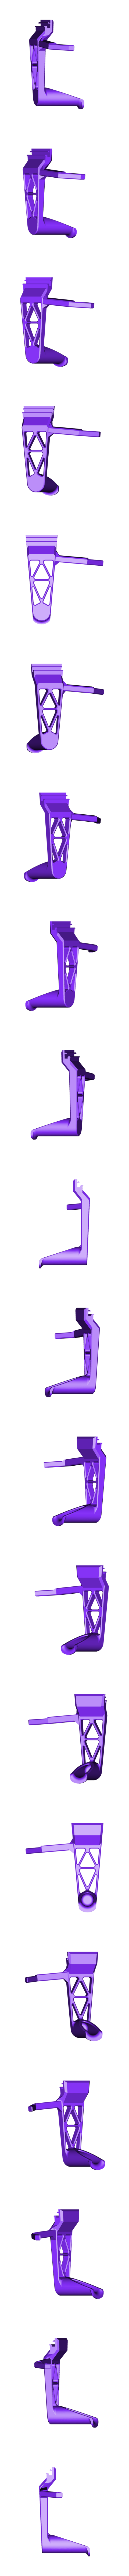 Filament_Holder_3.3.STL Download free STL file TEVO Tornado/20x20 Extrusion Filament Holder 3 • 3D printable object, 3D_Cre8or